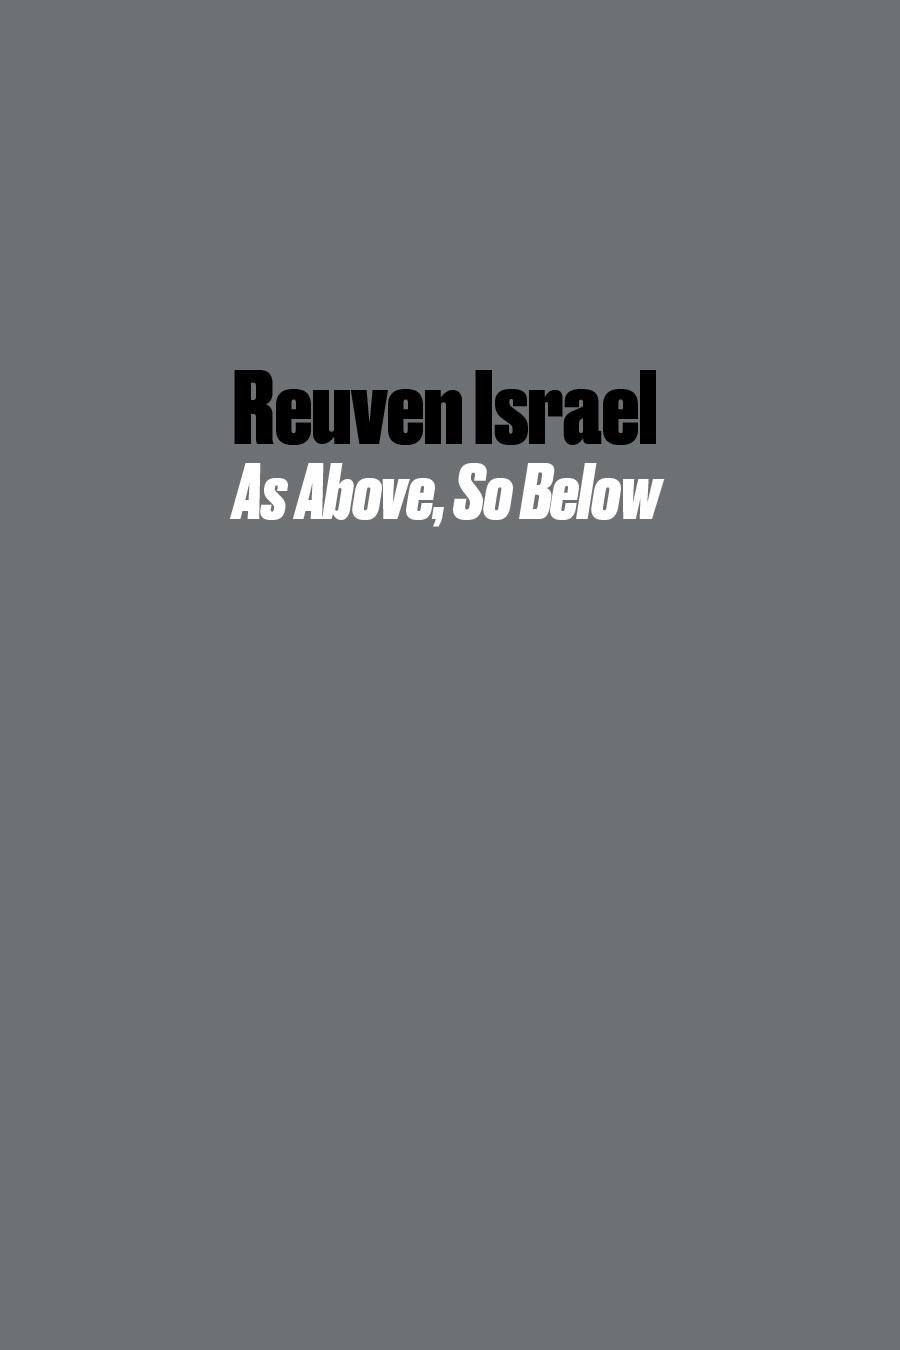 Reuven-Israel-as-above-so-below-catalog-cover.jpg